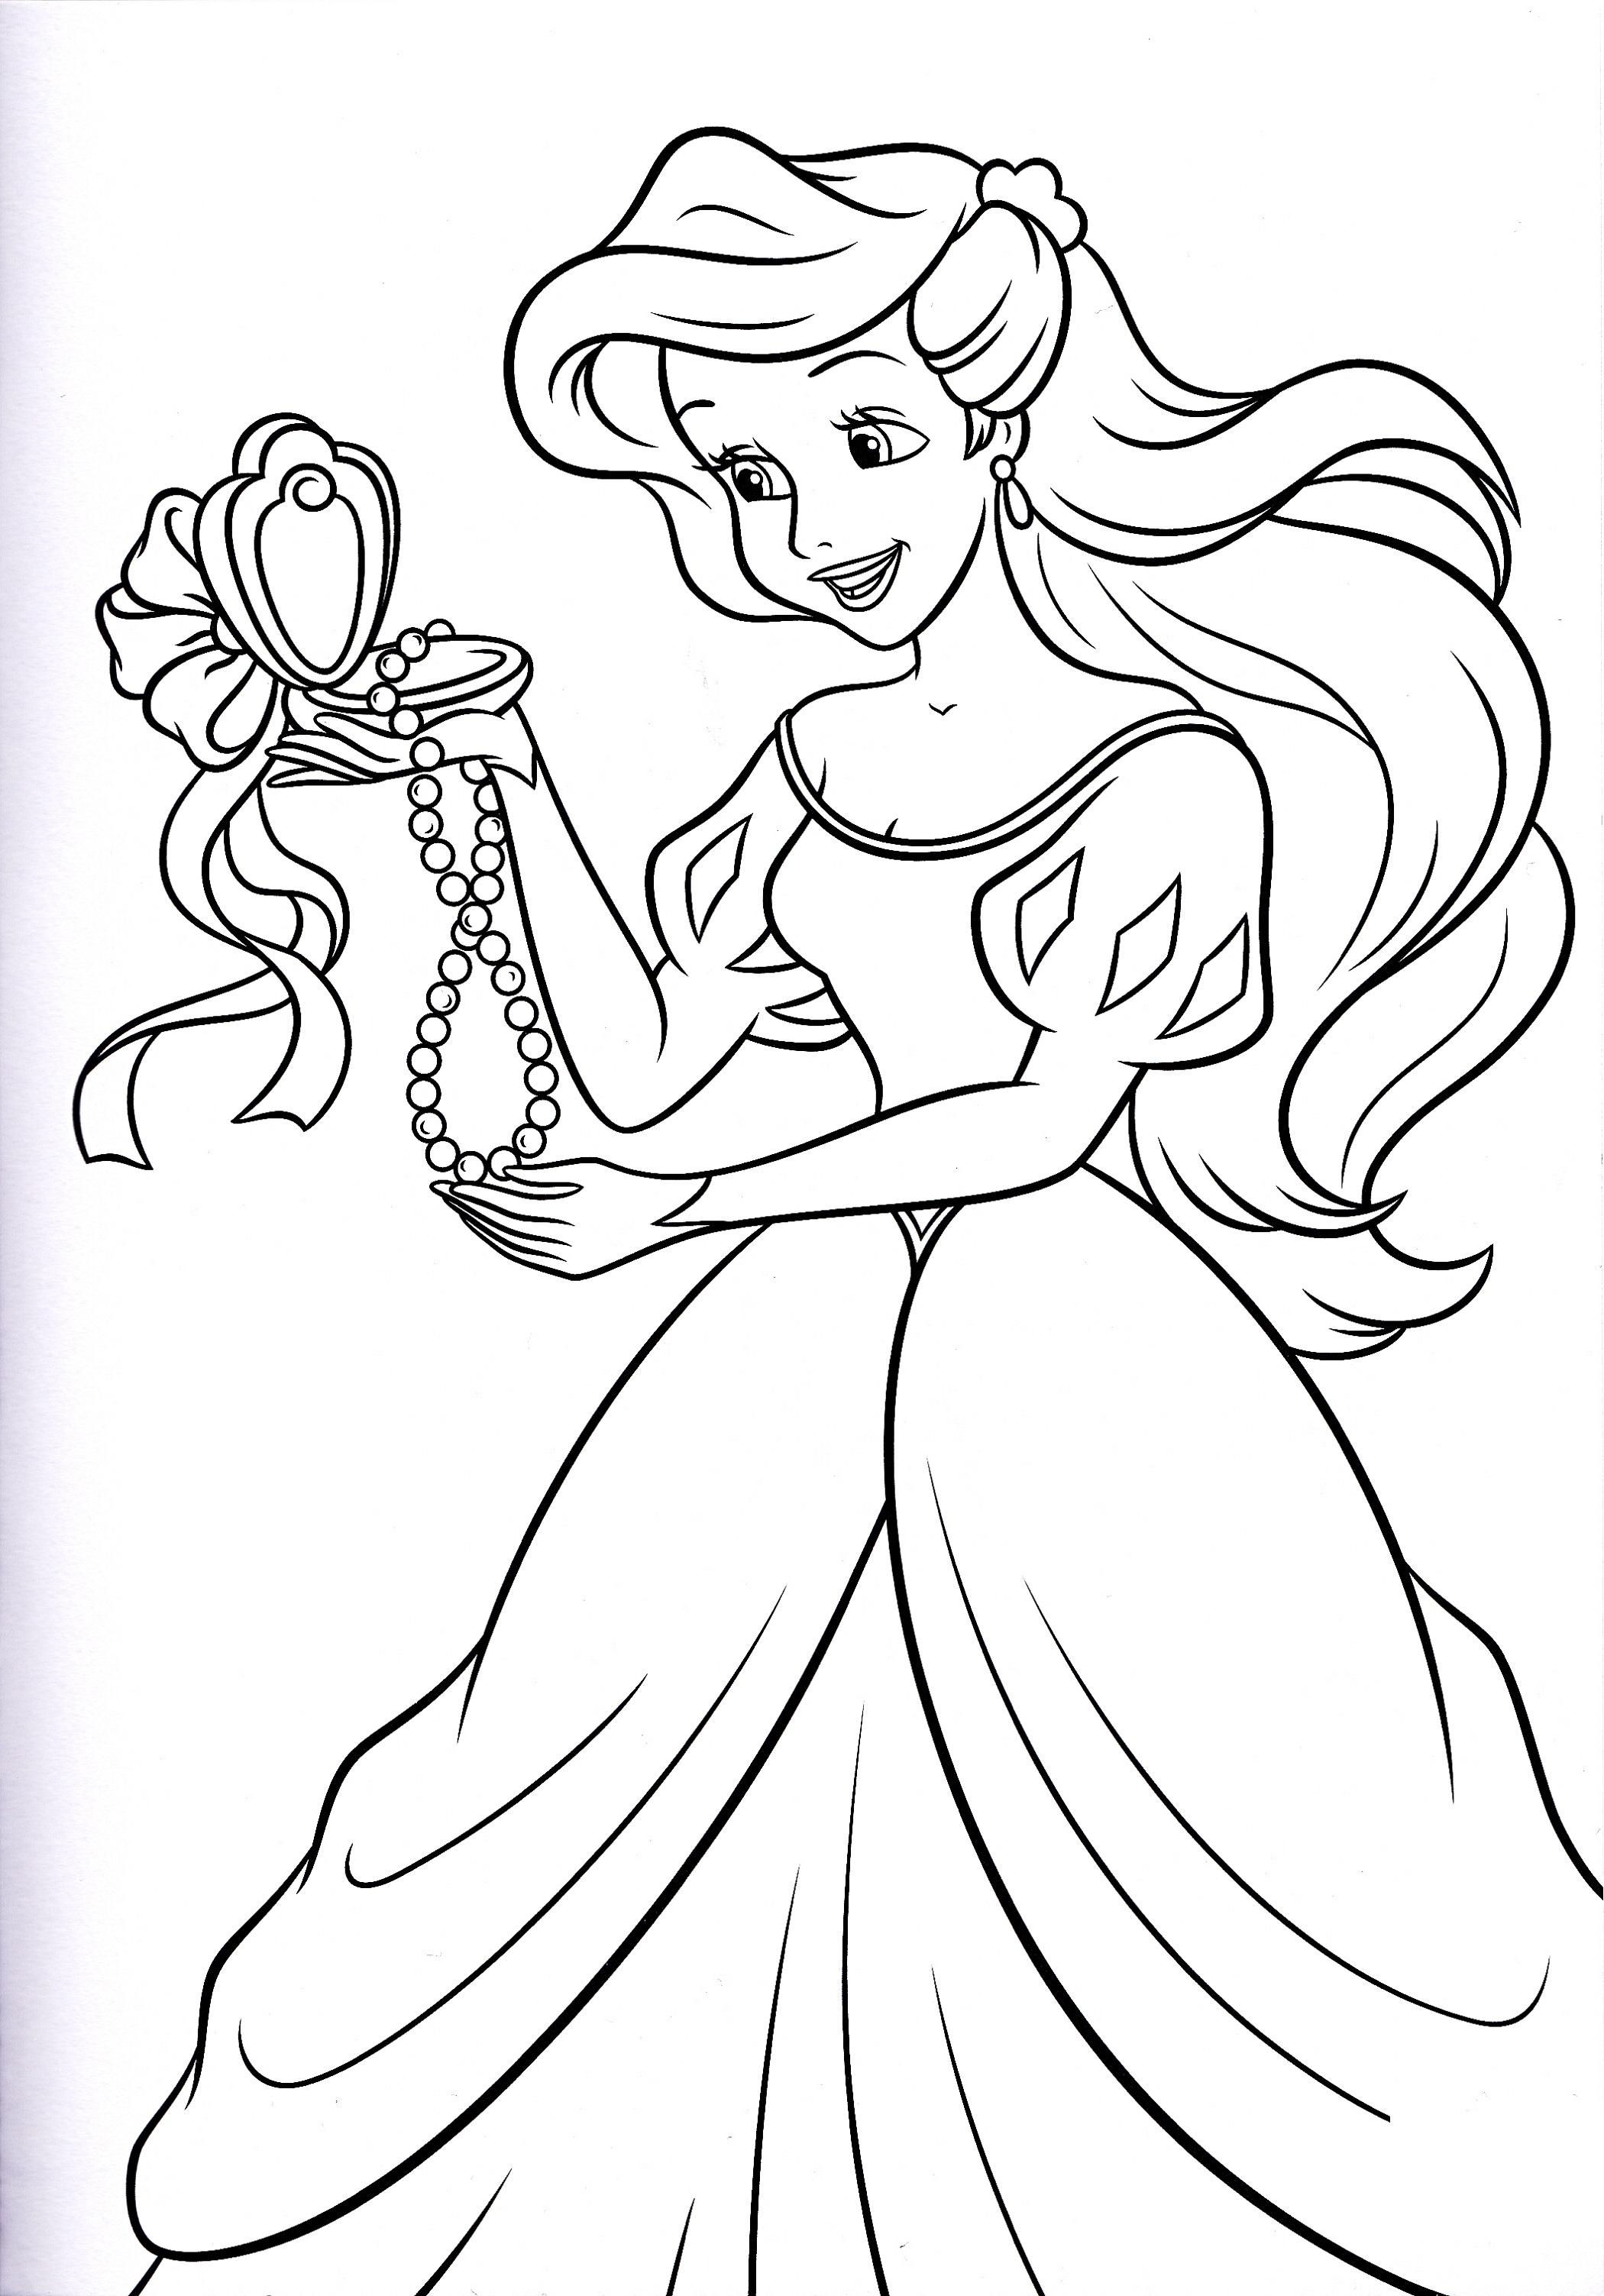 disney princess coloring pages 5